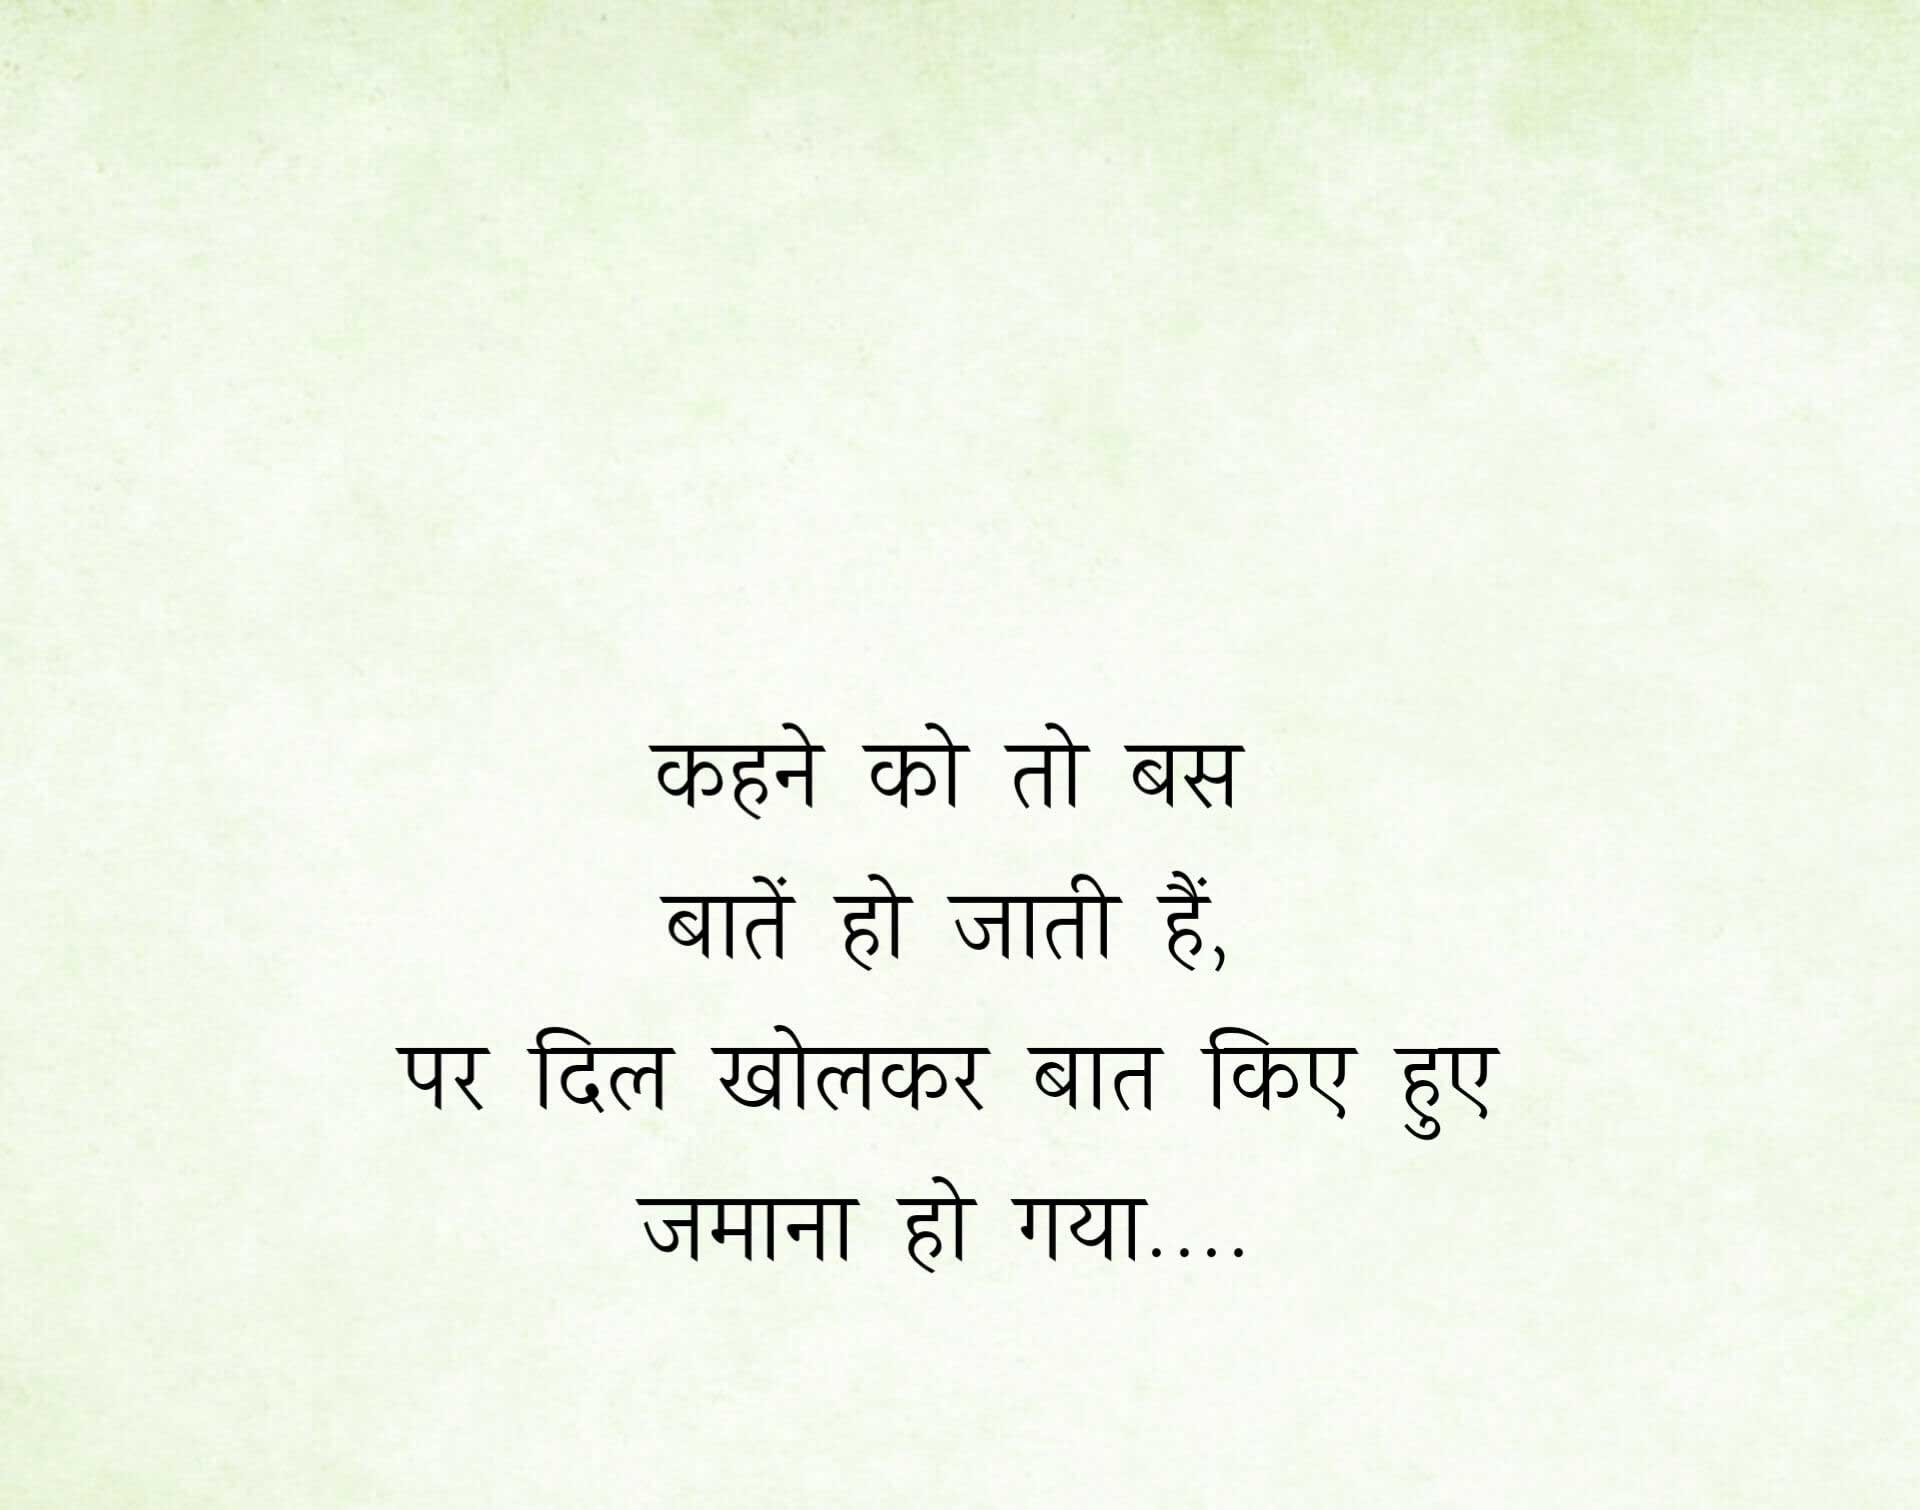 Best Hindi Life Quotes Whatsapp DP Pics Hd Free